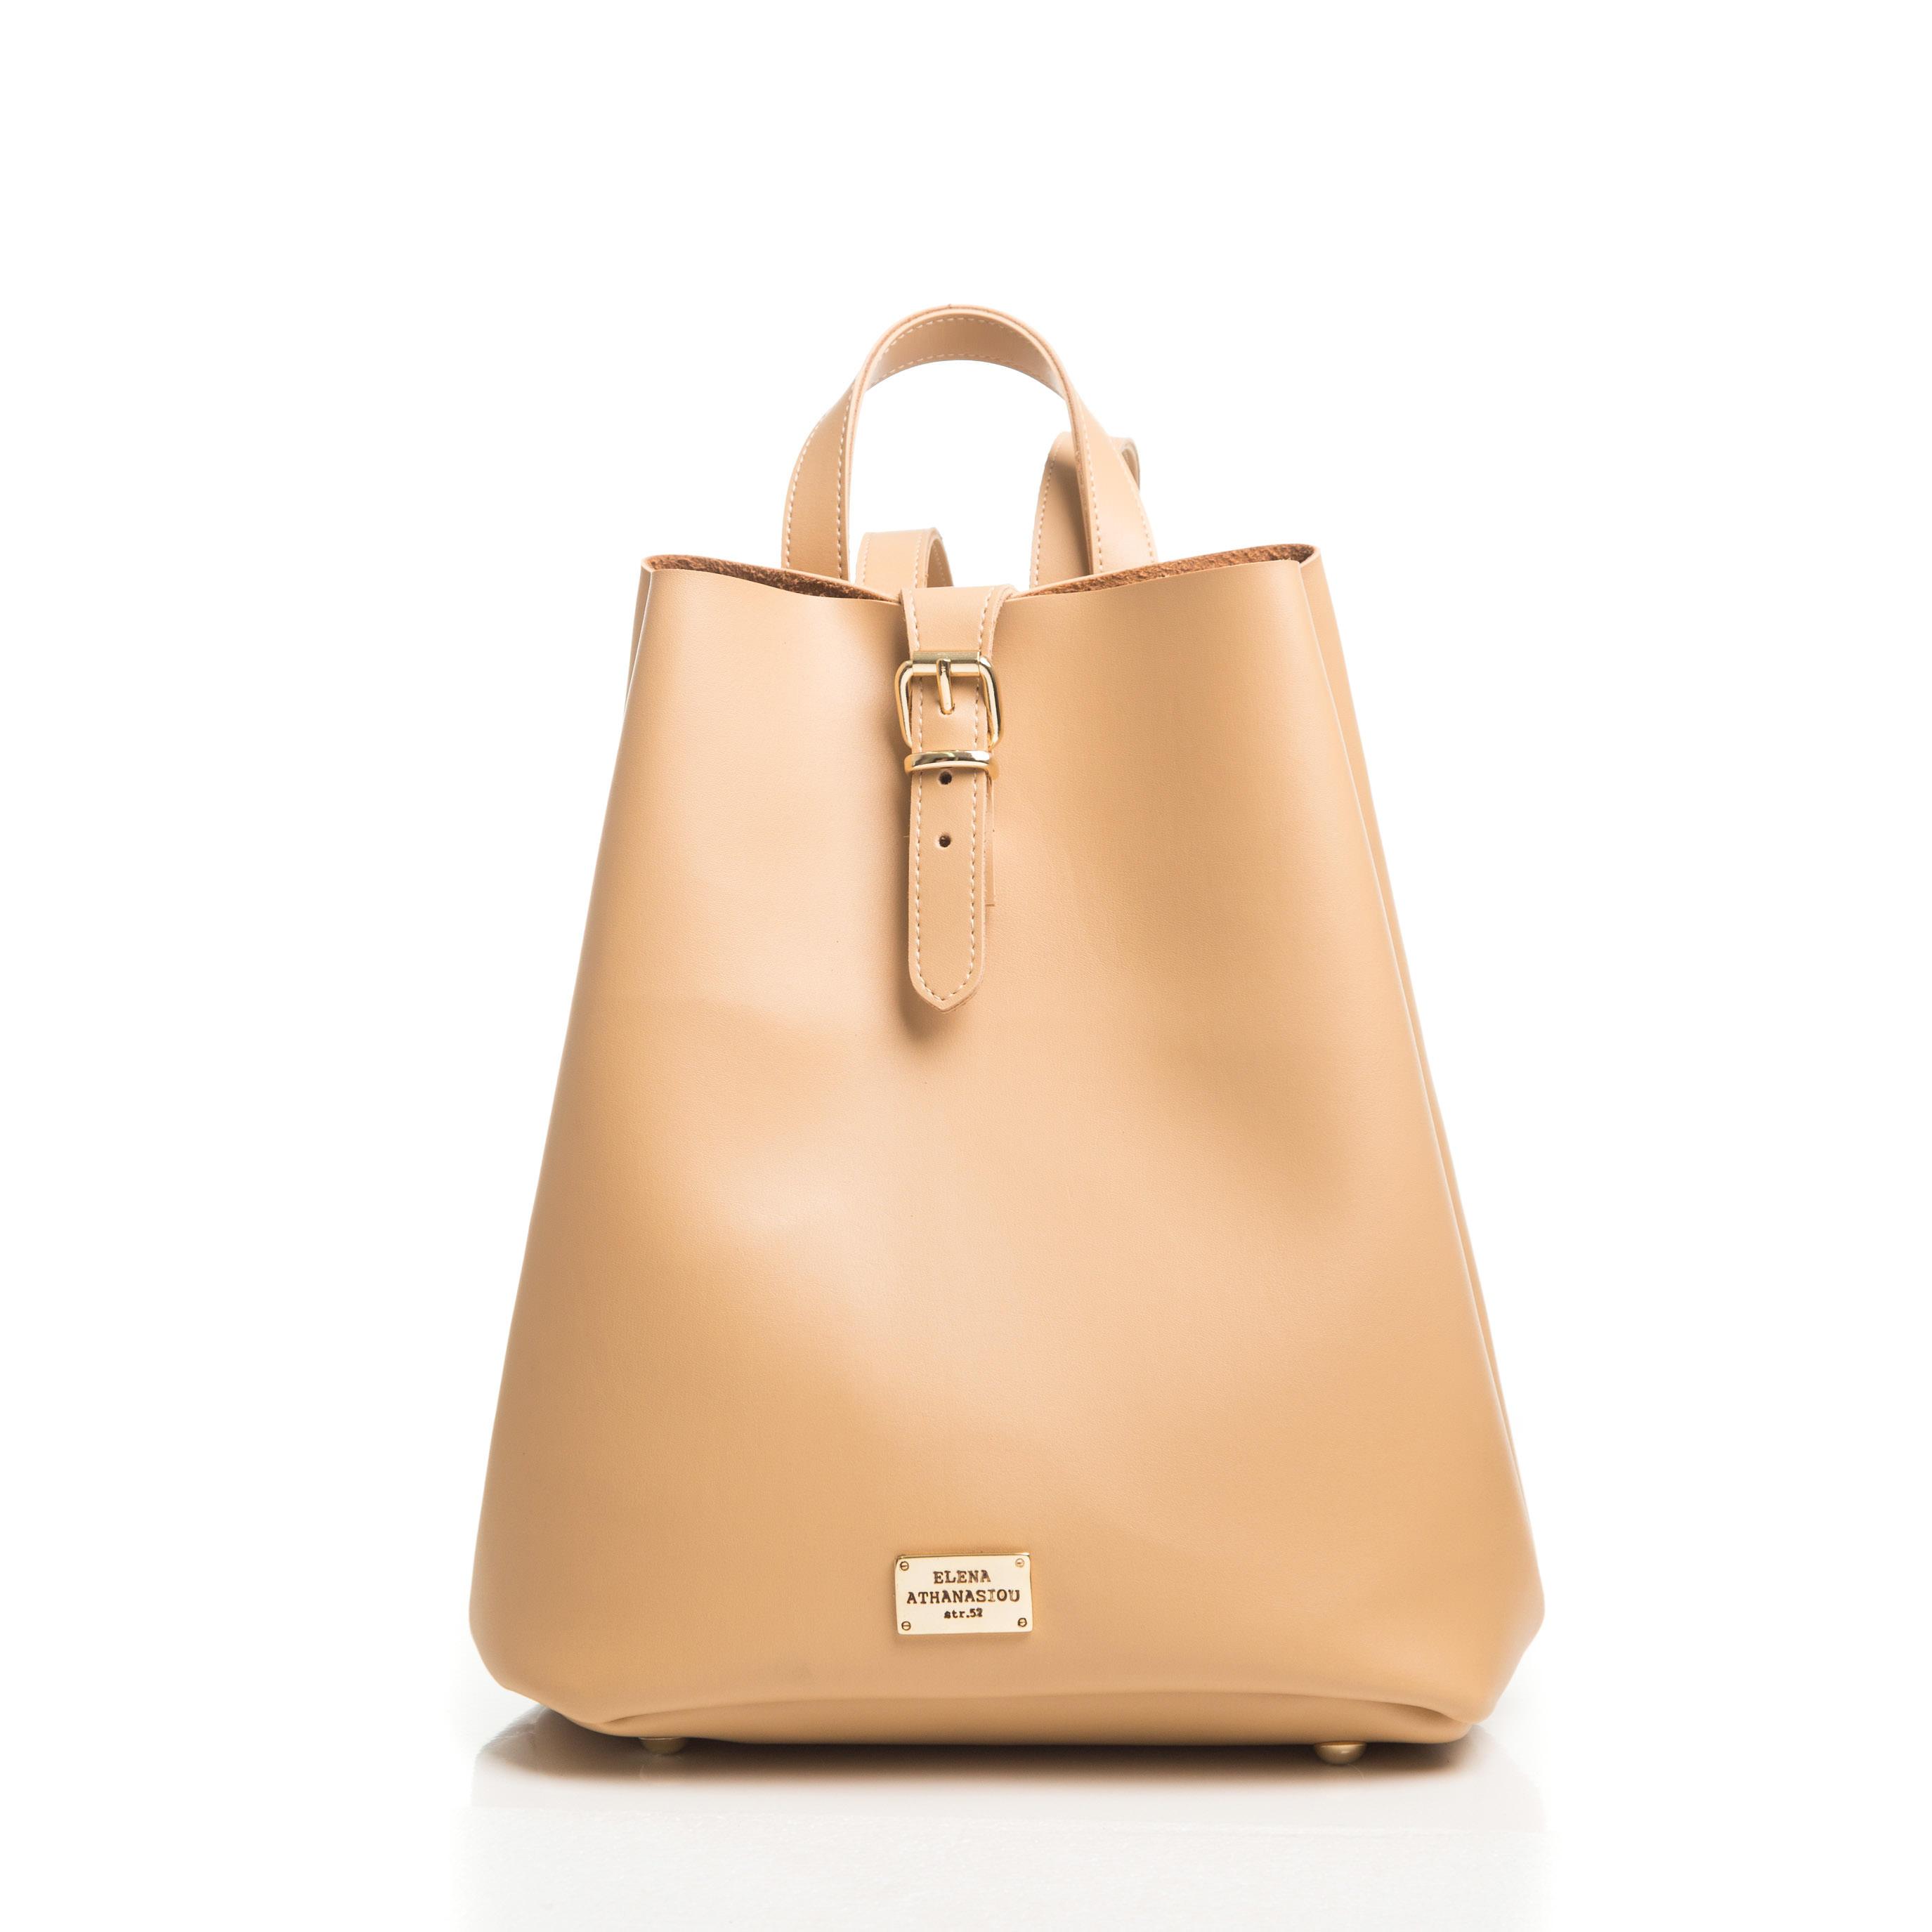 872679cc0d Backpack Vachetta